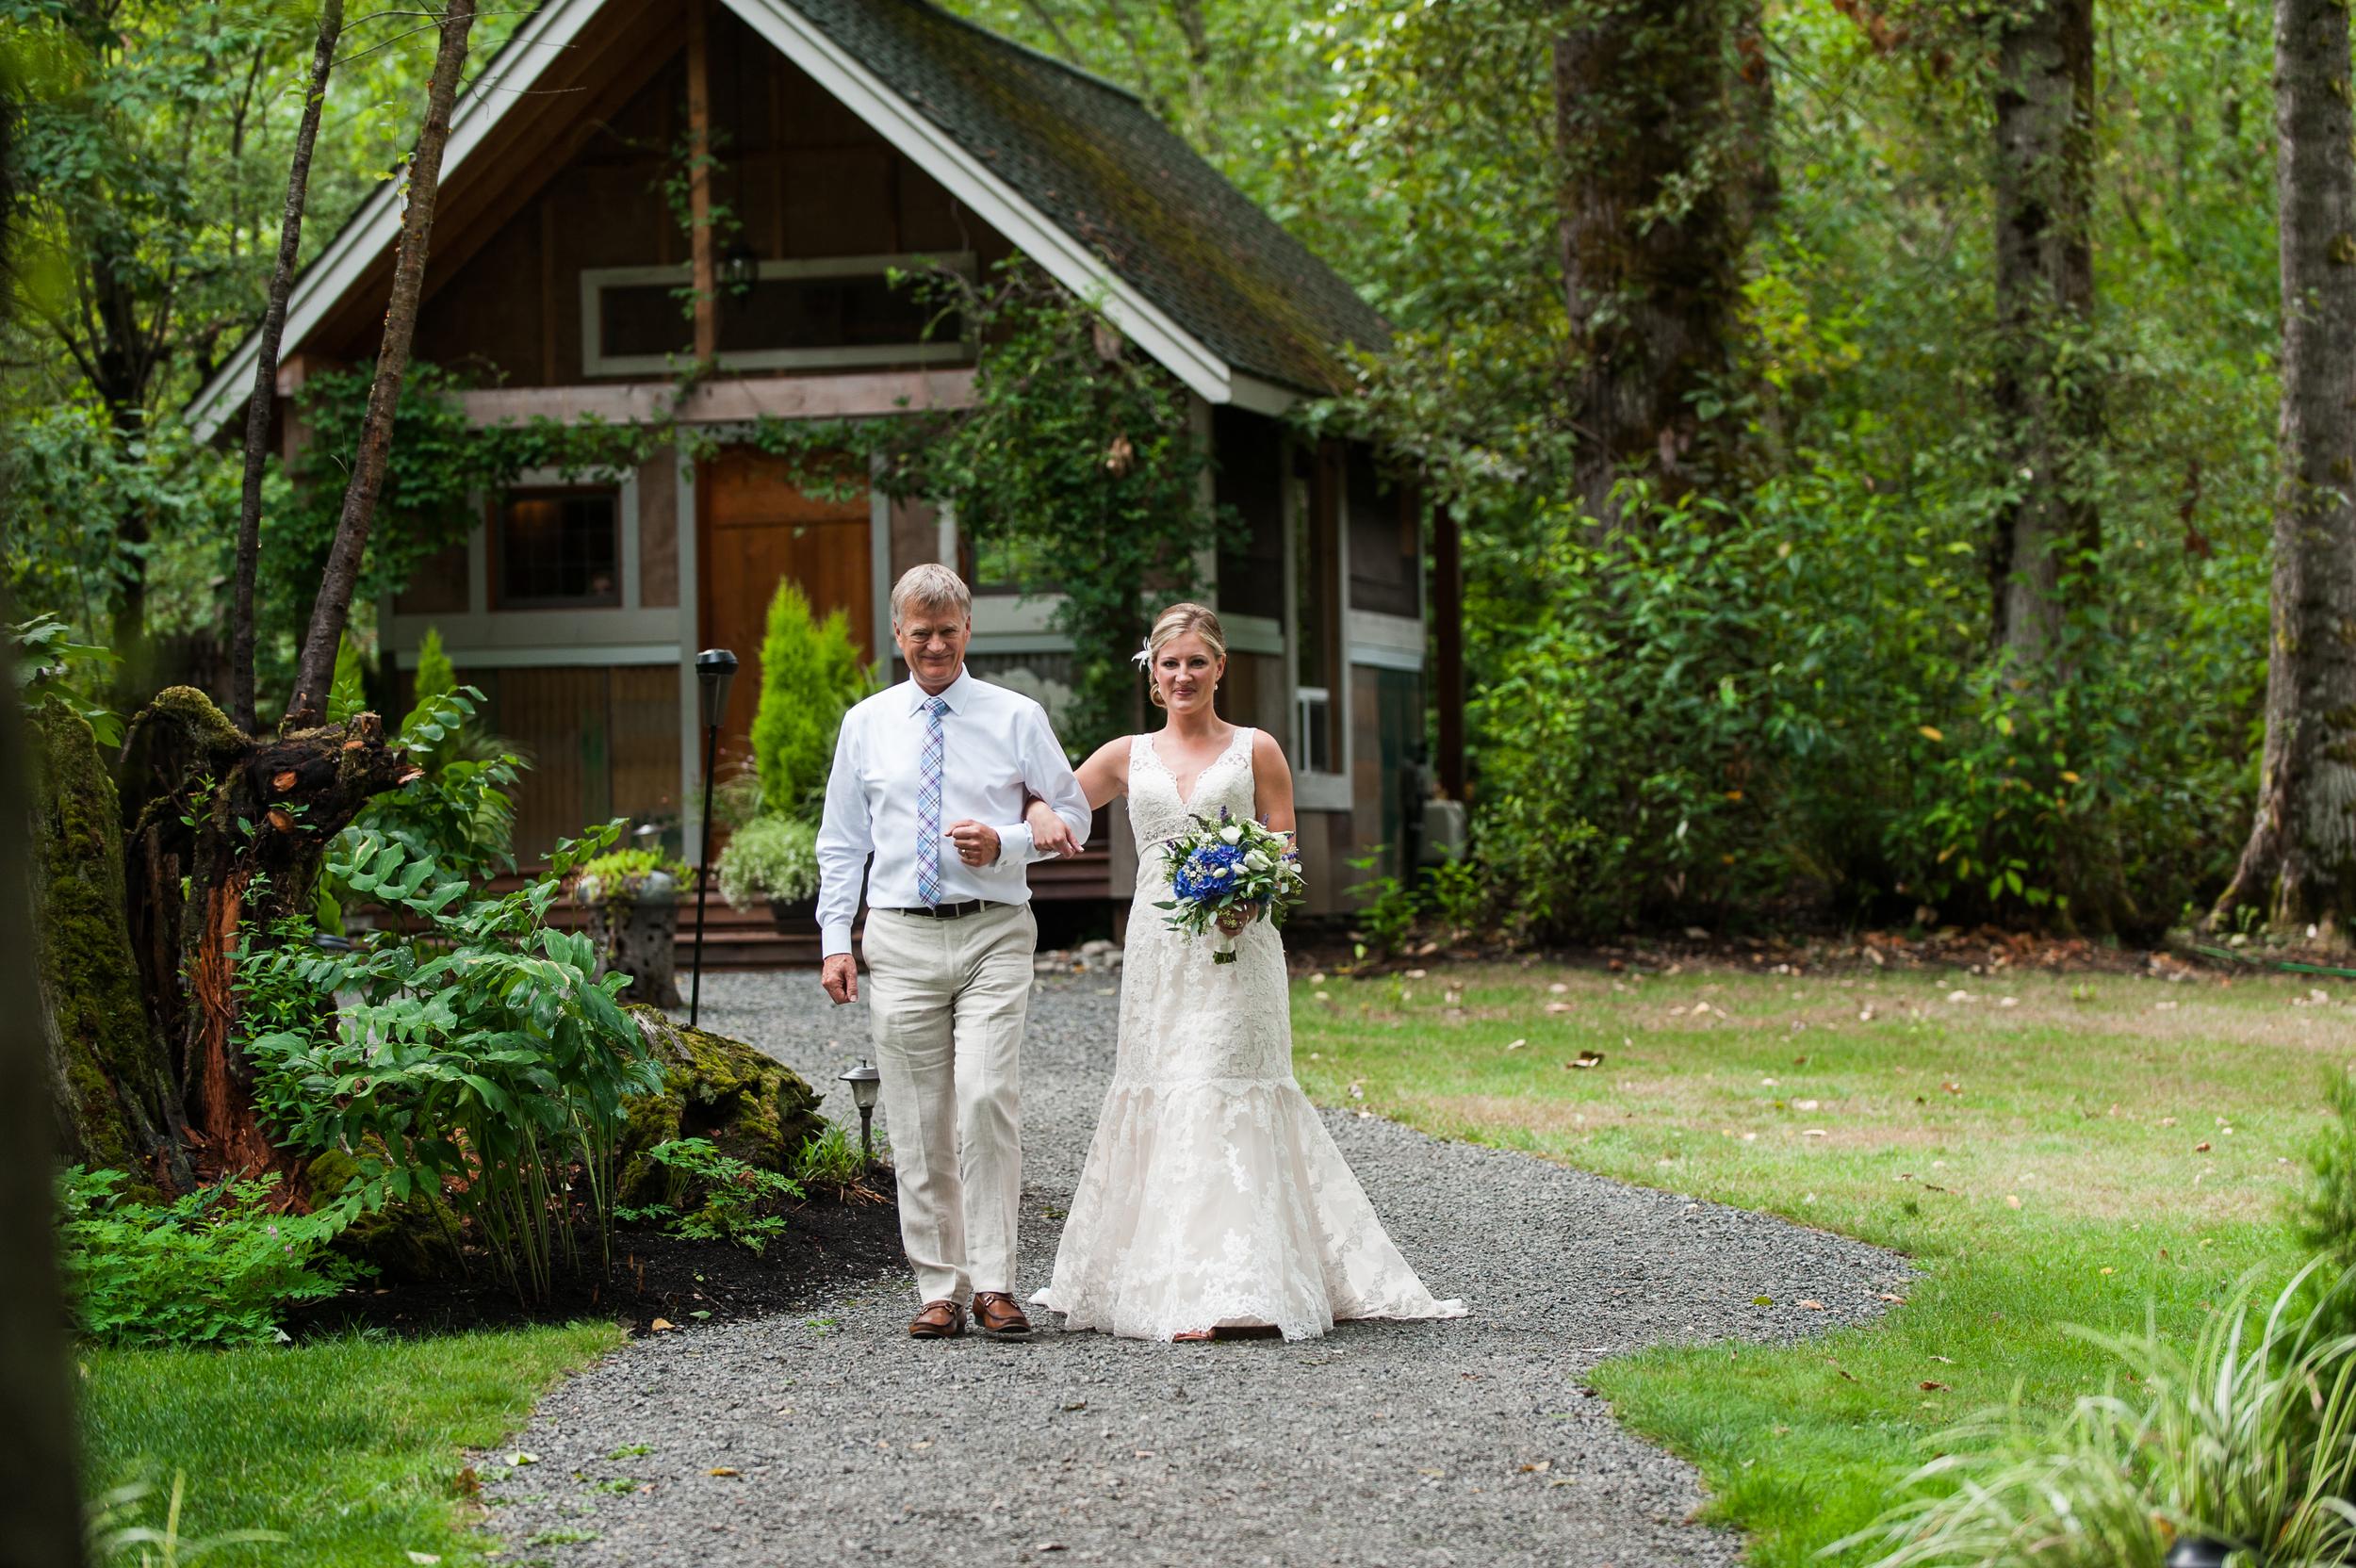 JJ-wedding-Van-Wyhe-Photography-338.jpg